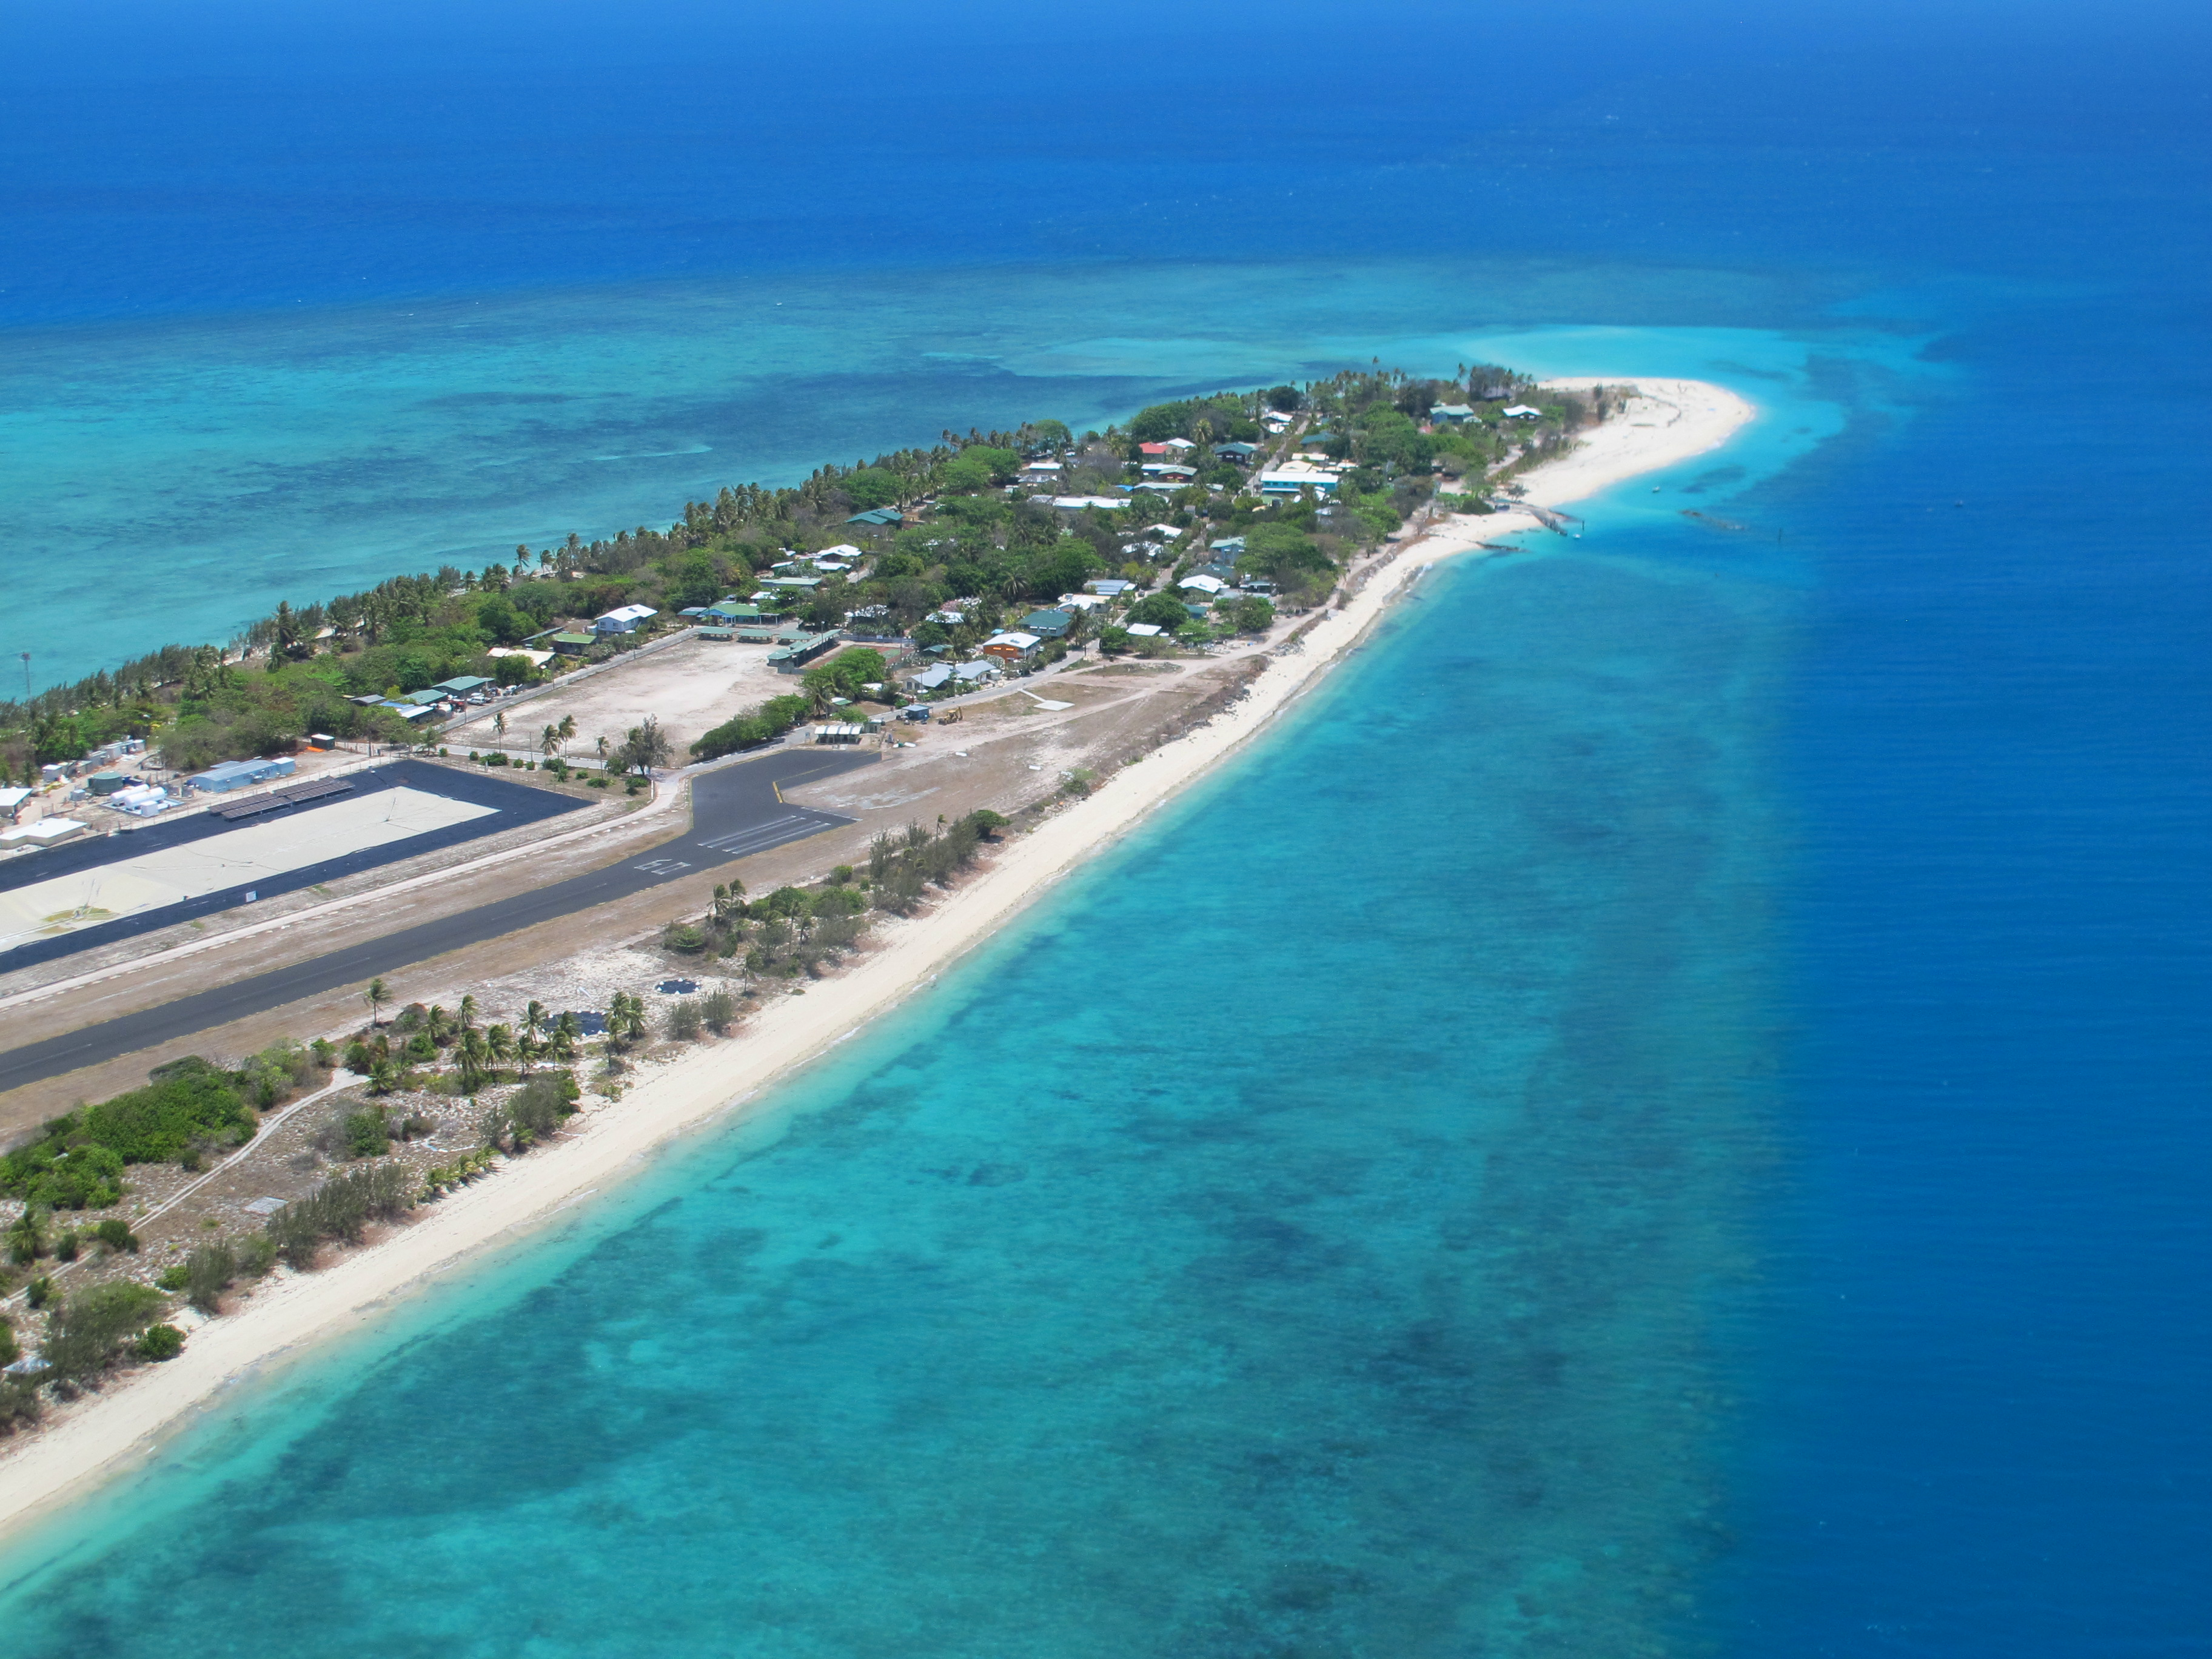 Coconut Island - Aerial view | Torres Strait